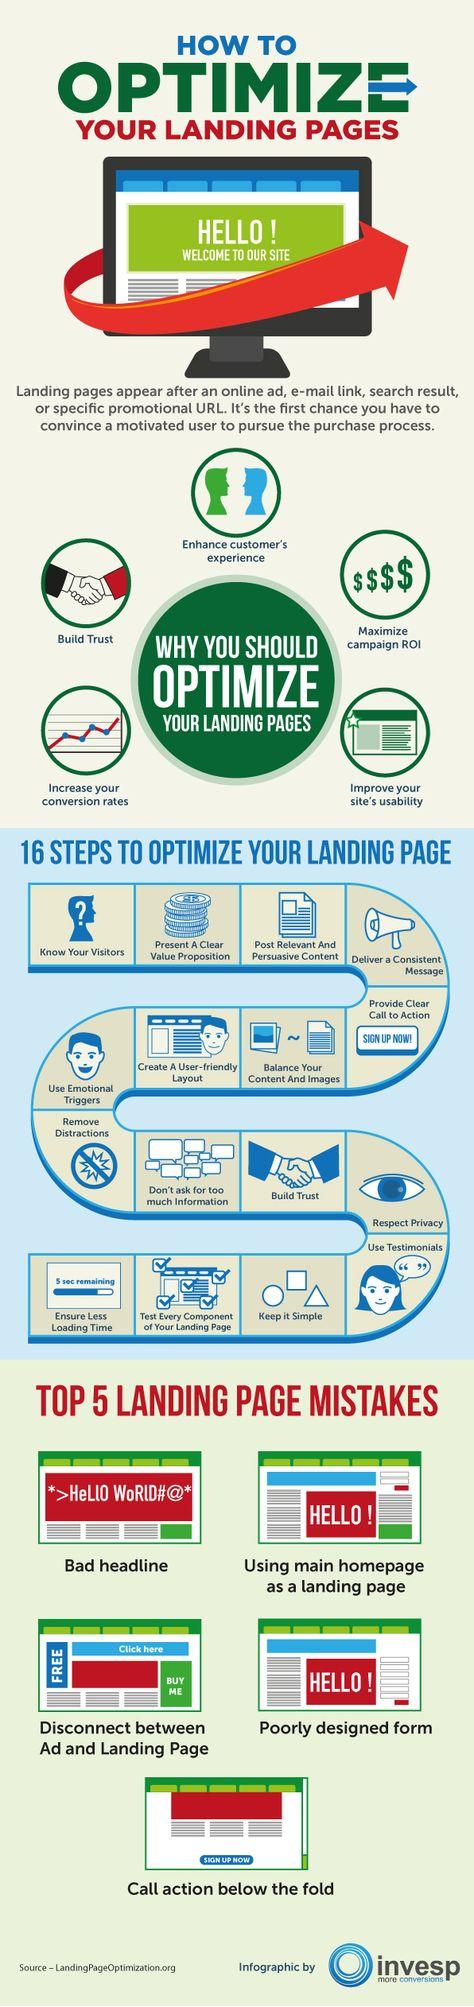 16 pasos para optimizar landing pages #infografia #infographic #internet #marketing - TICs y Formación